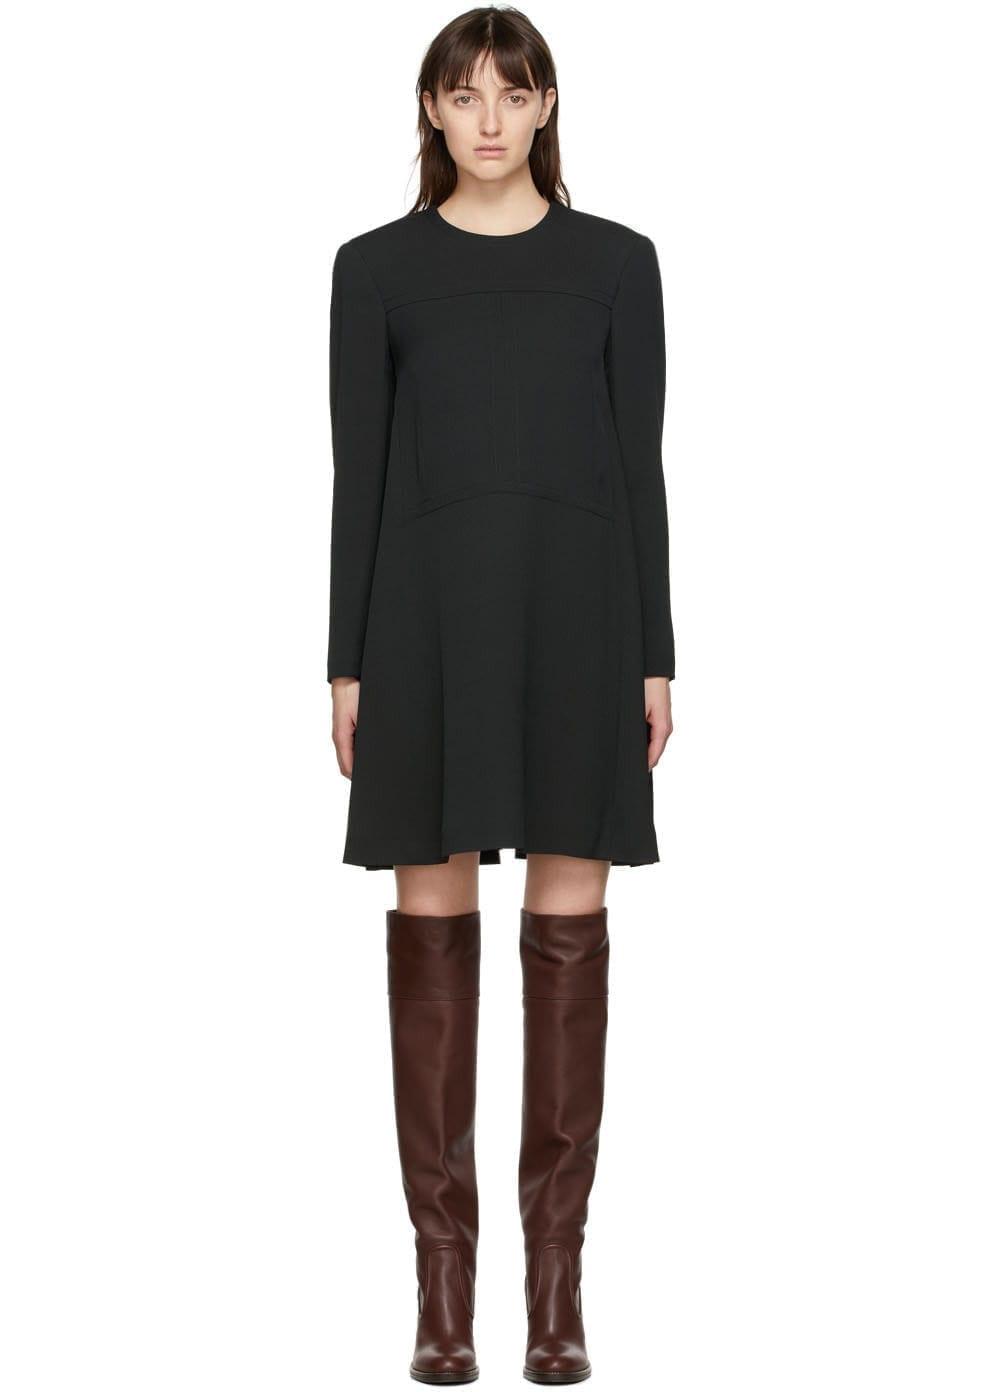 CHLOÉ Black Crepe Dress